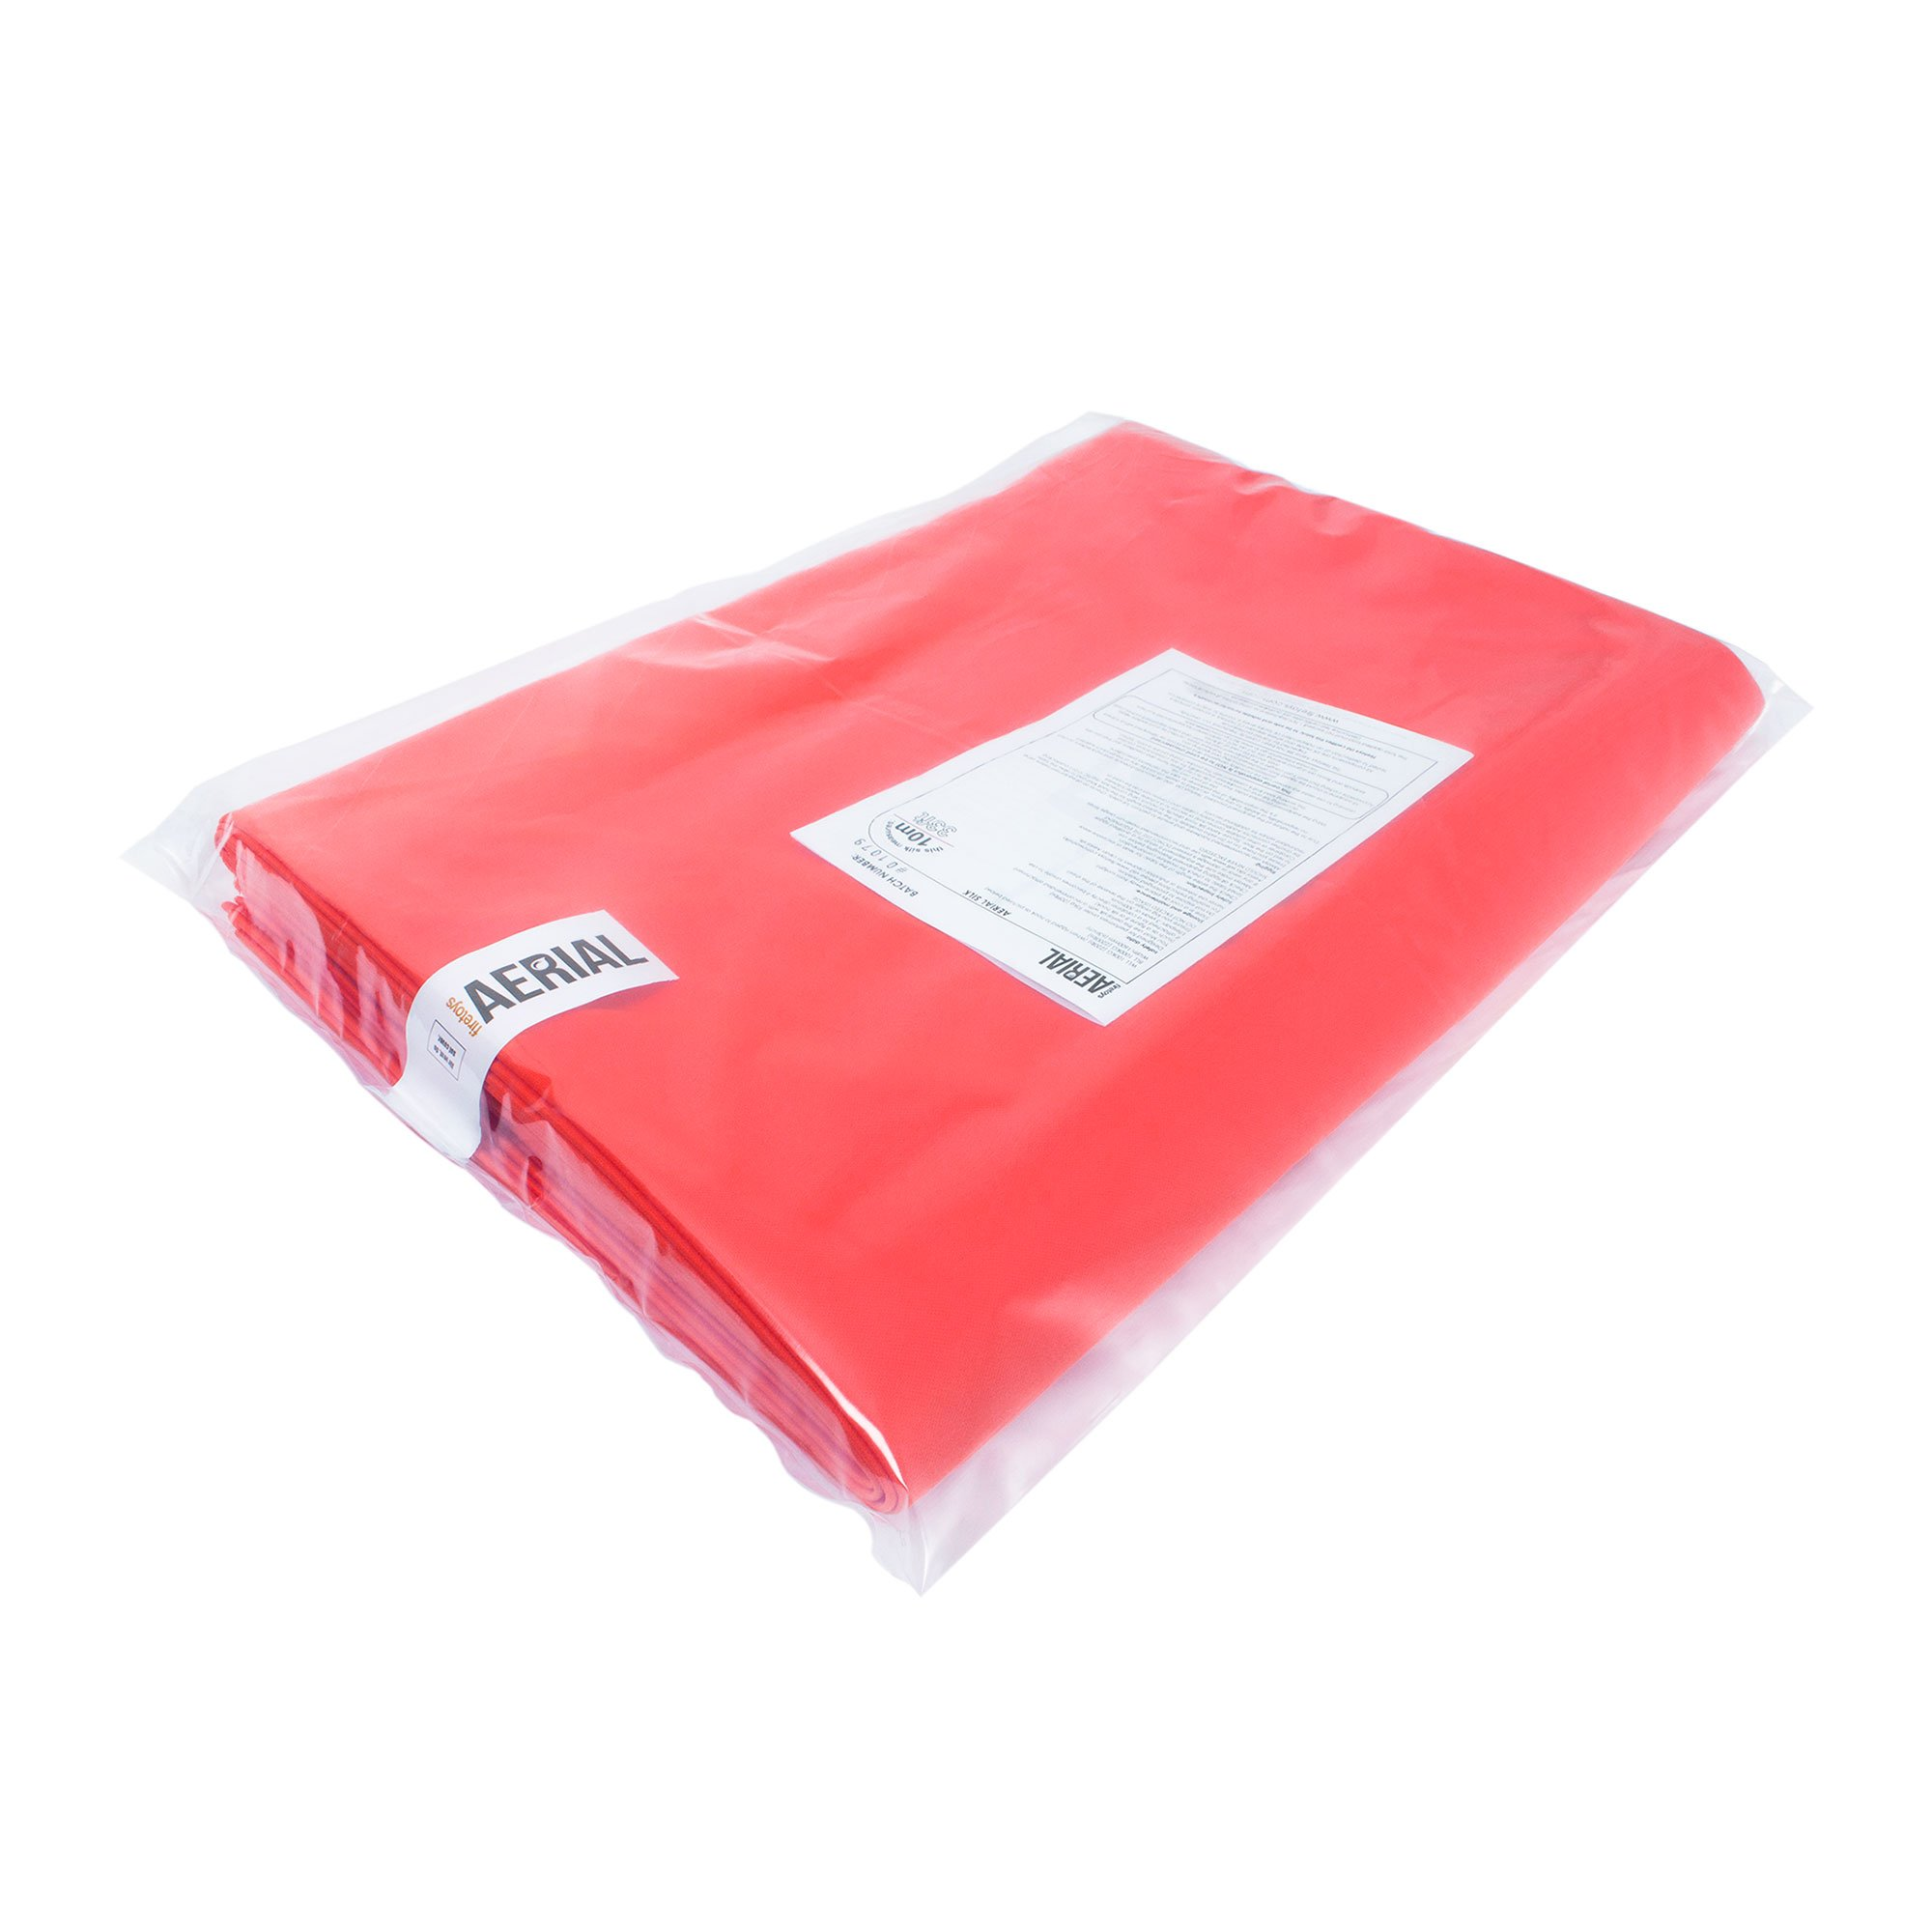 Firetoys Professional Aerial Silks Fabric/Tissues, Medium Stretch Silk WLL 128kg (Red, 8 Metre) by Firetoys (Image #4)